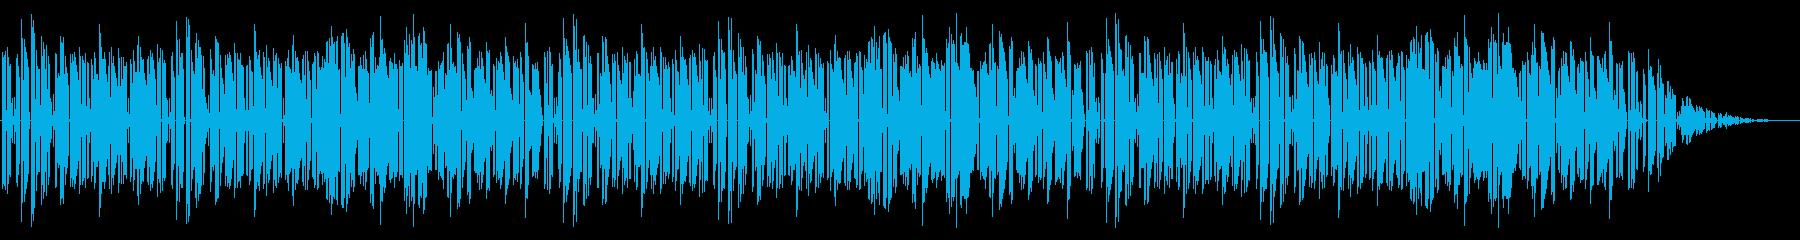 GB風シューティングのステージ曲の再生済みの波形